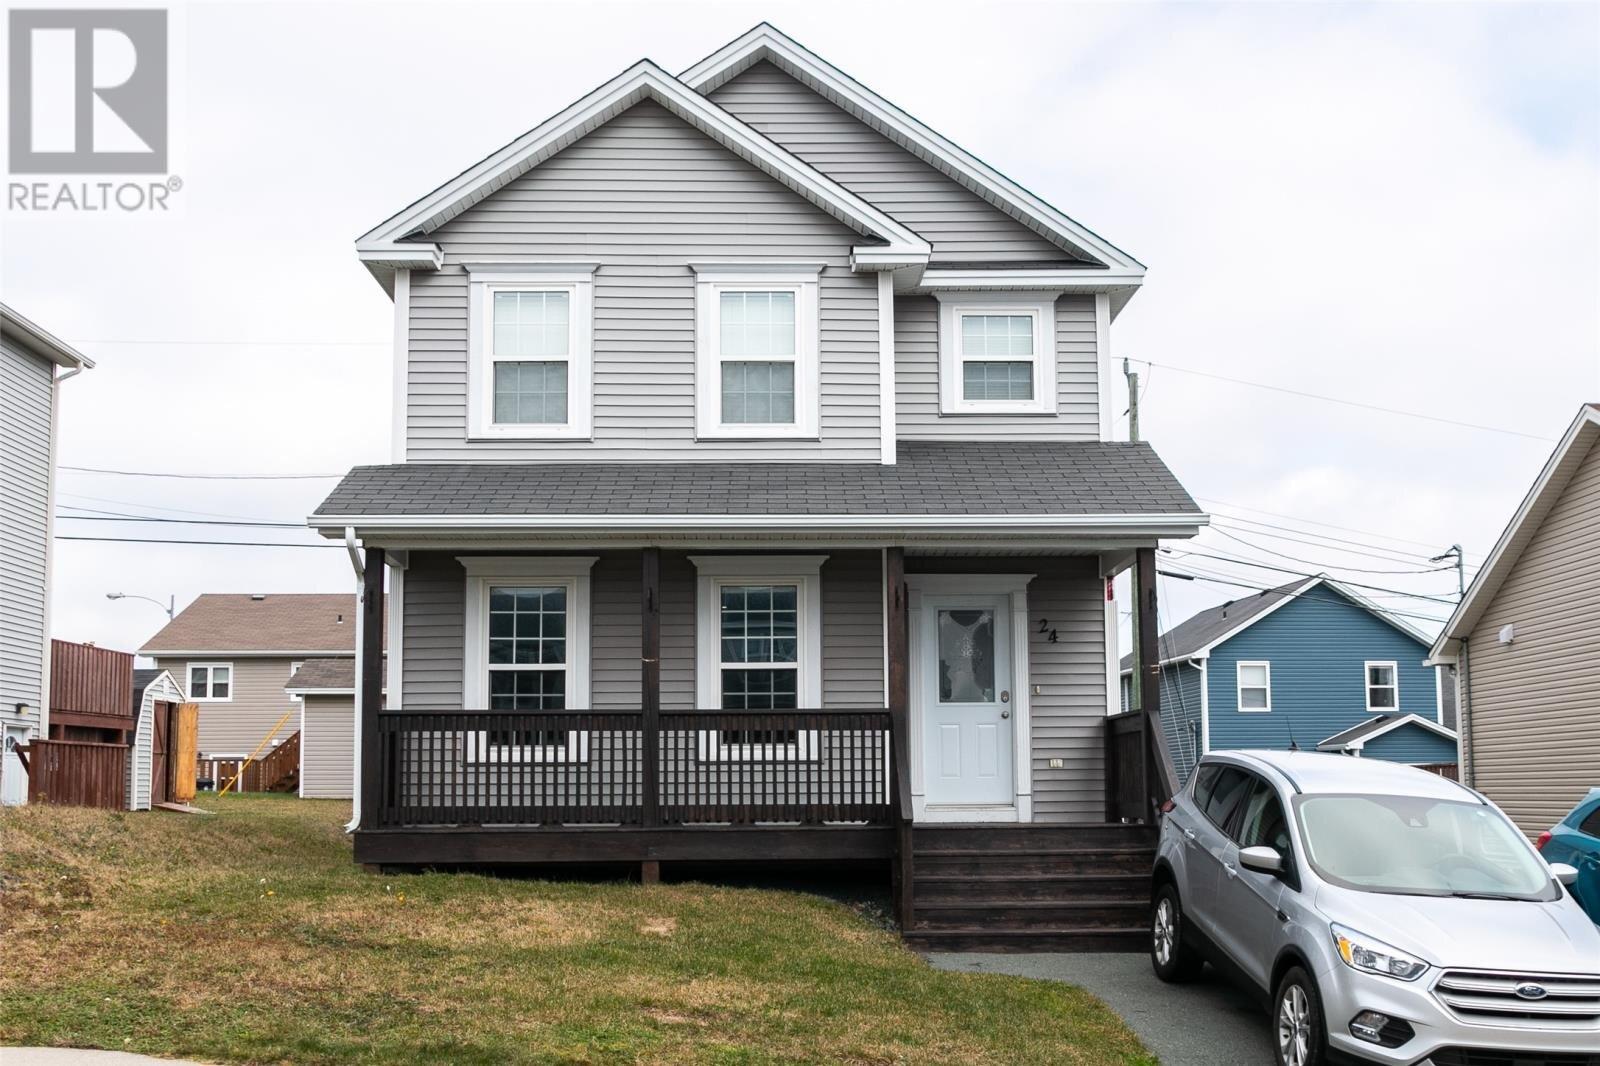 House for sale at 24 Hamlet St St. John's Newfoundland - MLS: 1223344